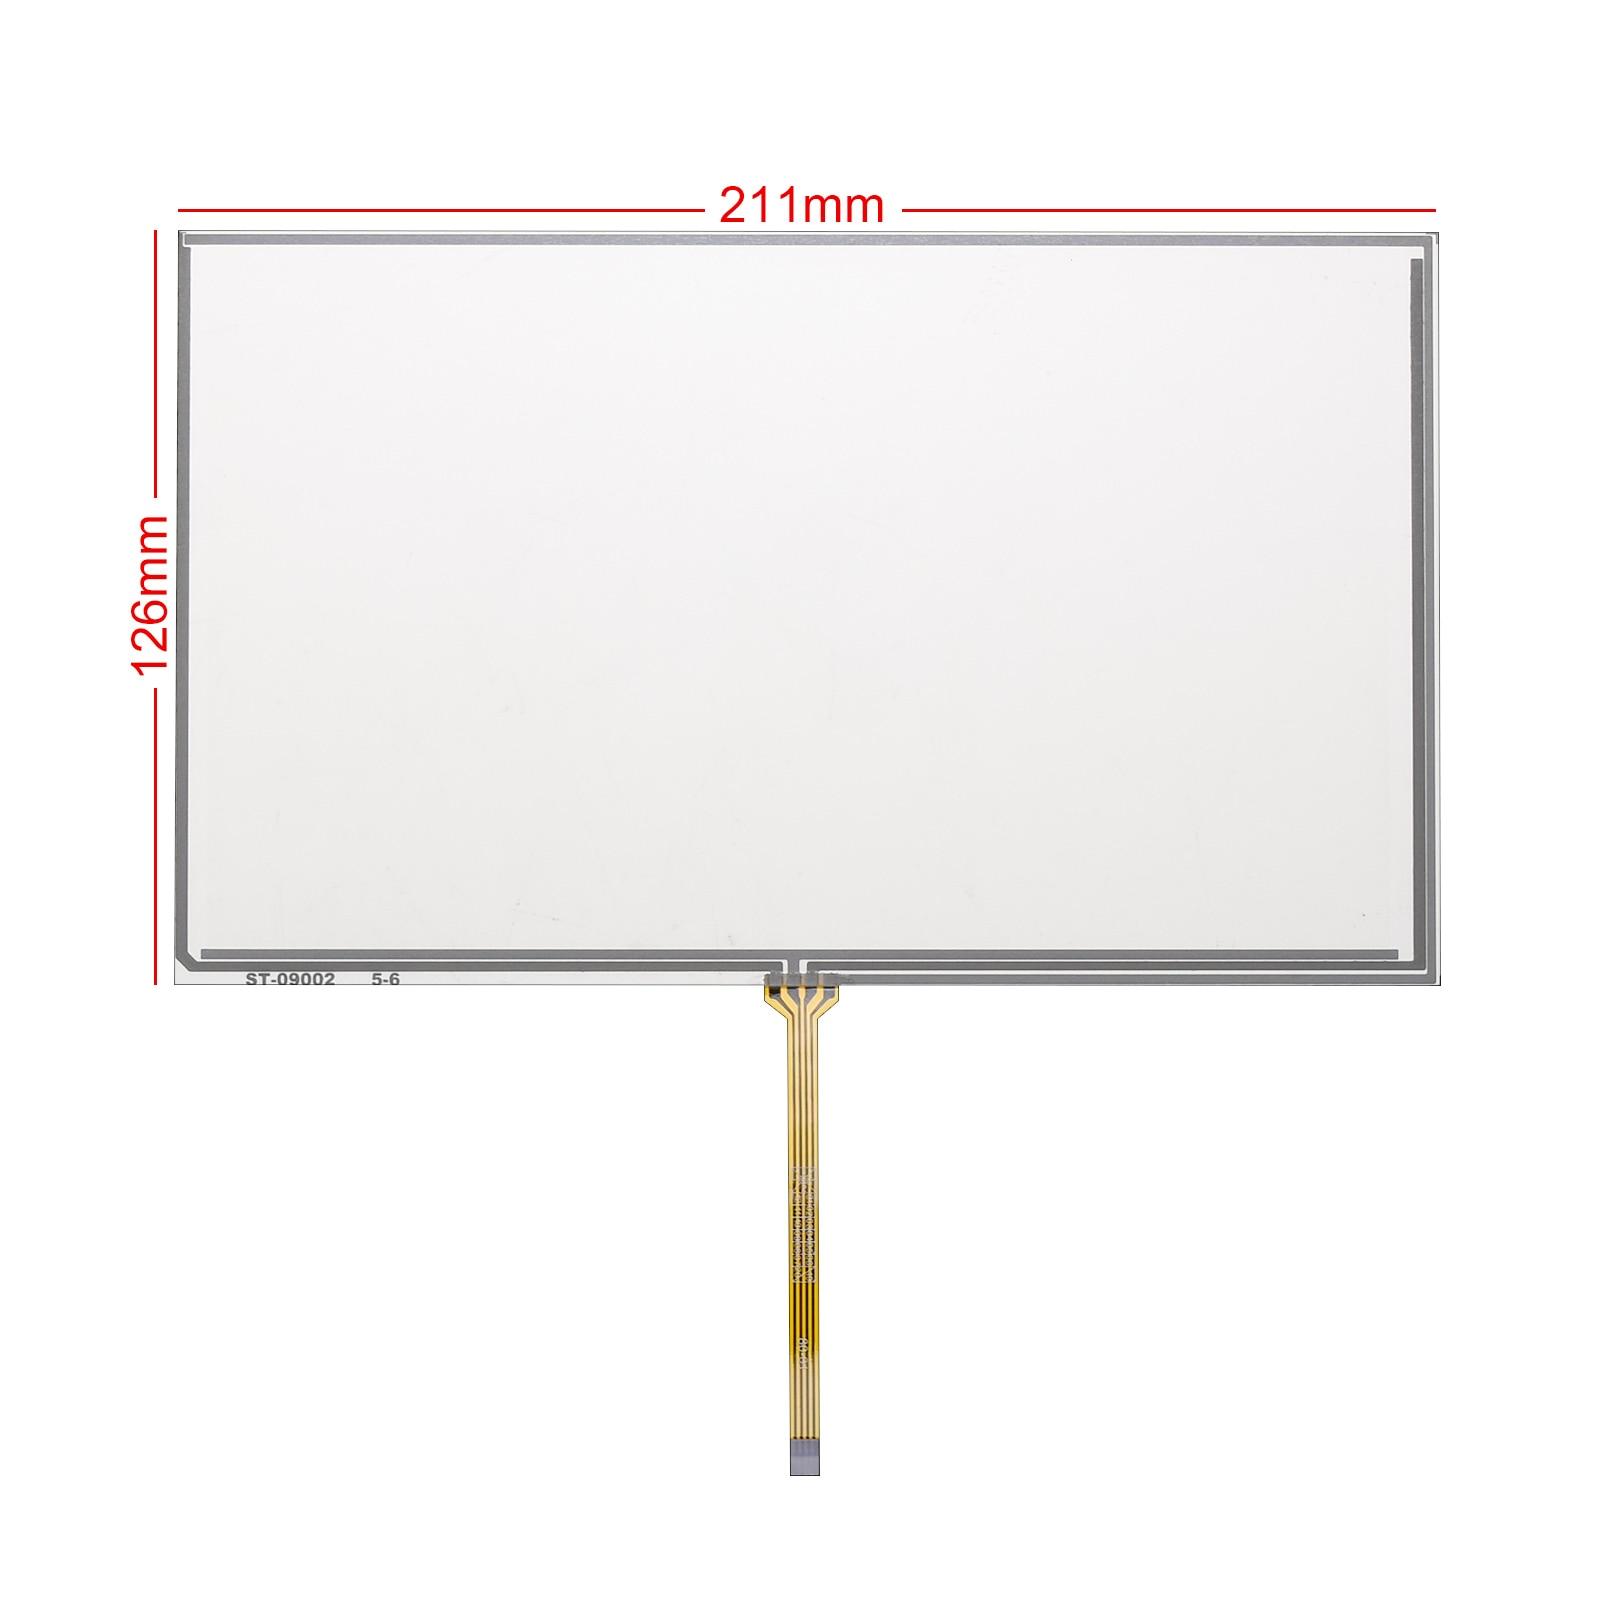 Para Sensor de resistencia de Panel de pantalla táctil resistivo, digitalizador de cable medio de 9 pulgadas, 211x126MM AT090TN10 AT090TN12